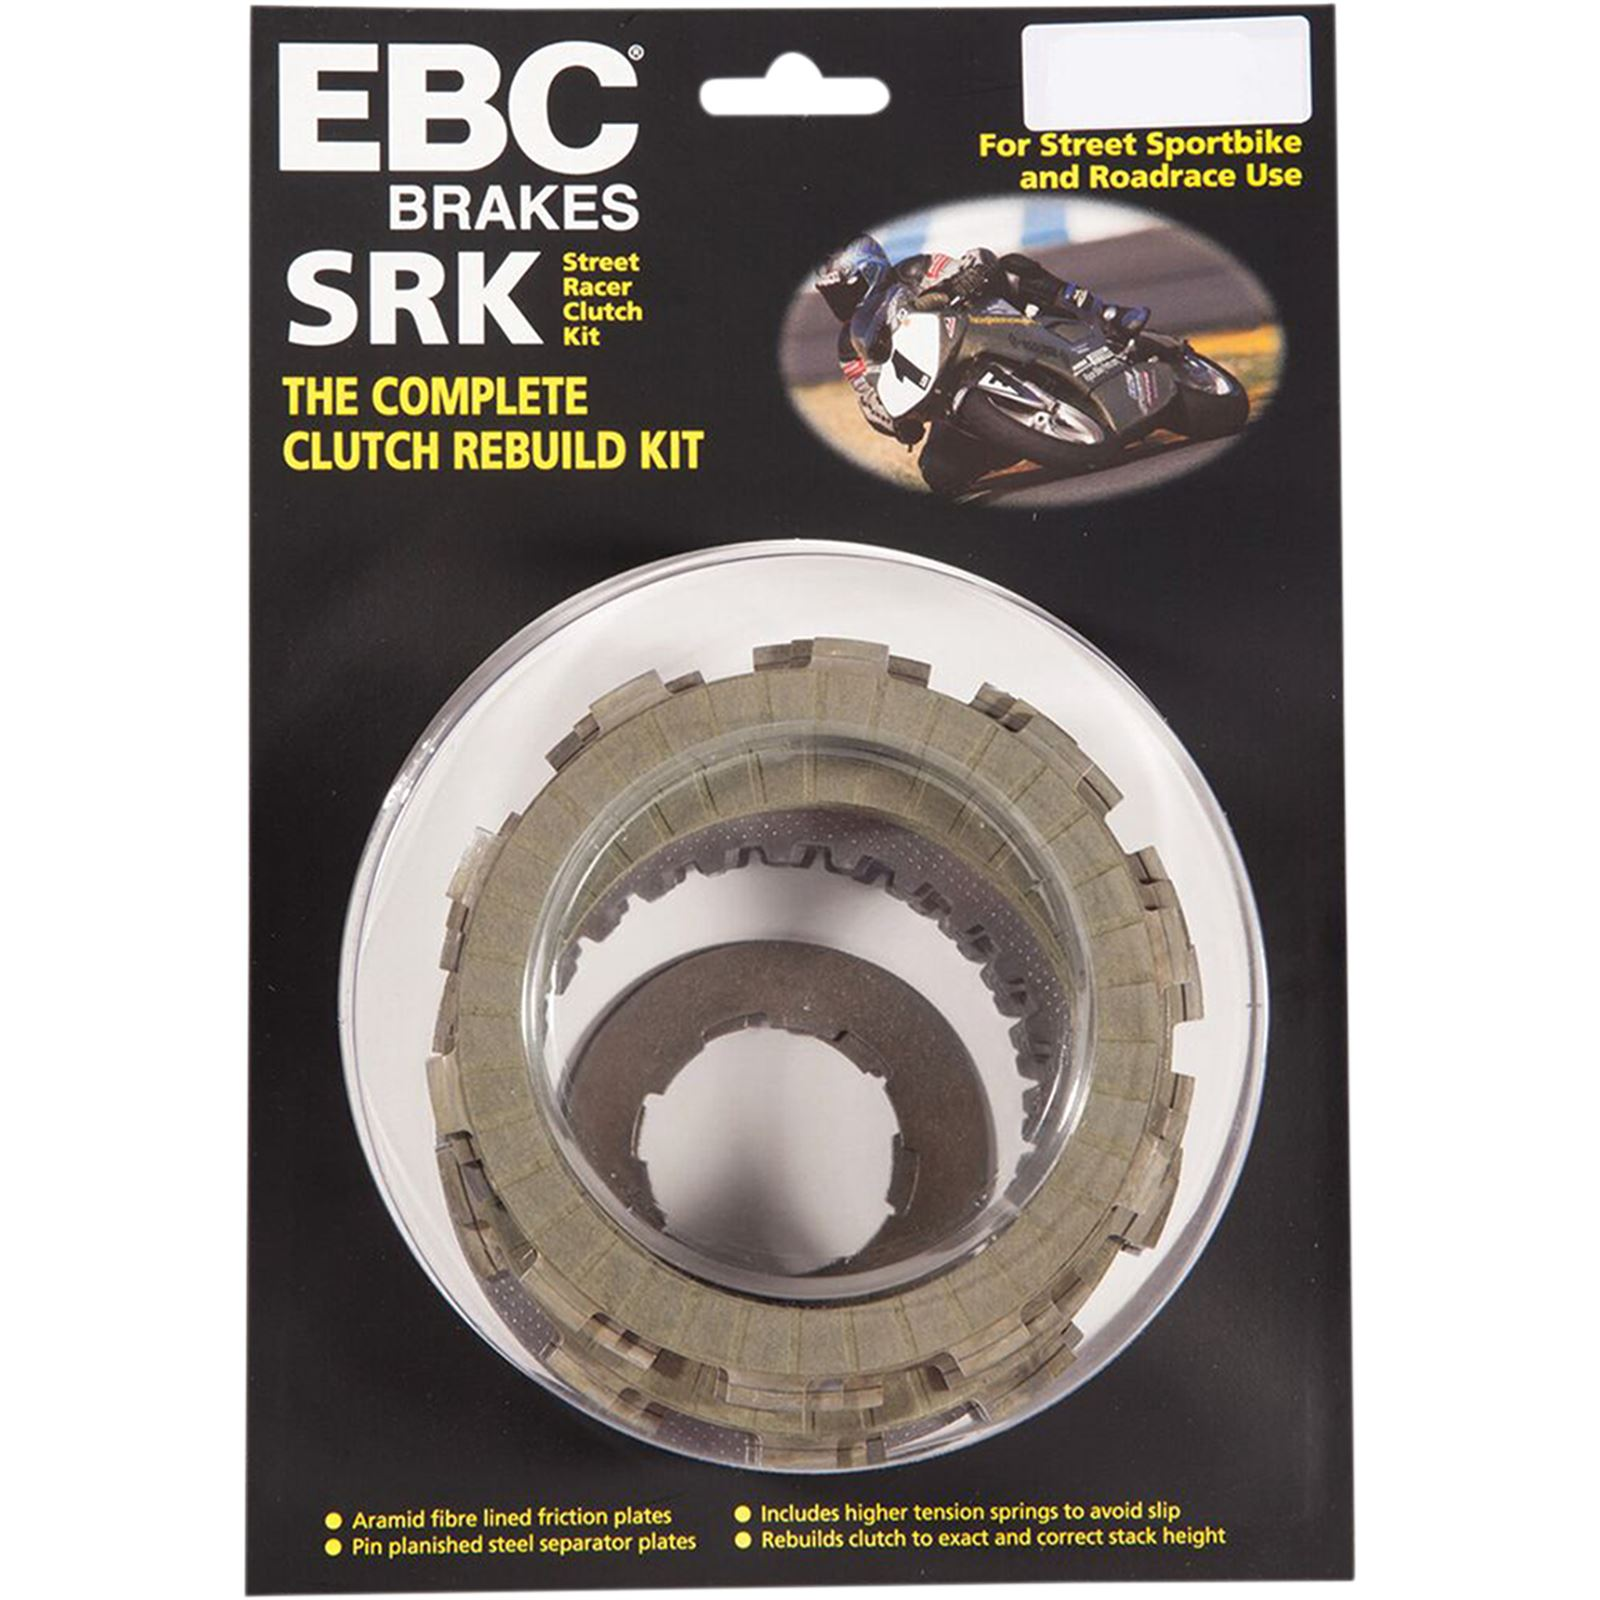 EBC SRK Complete Clutch Kit